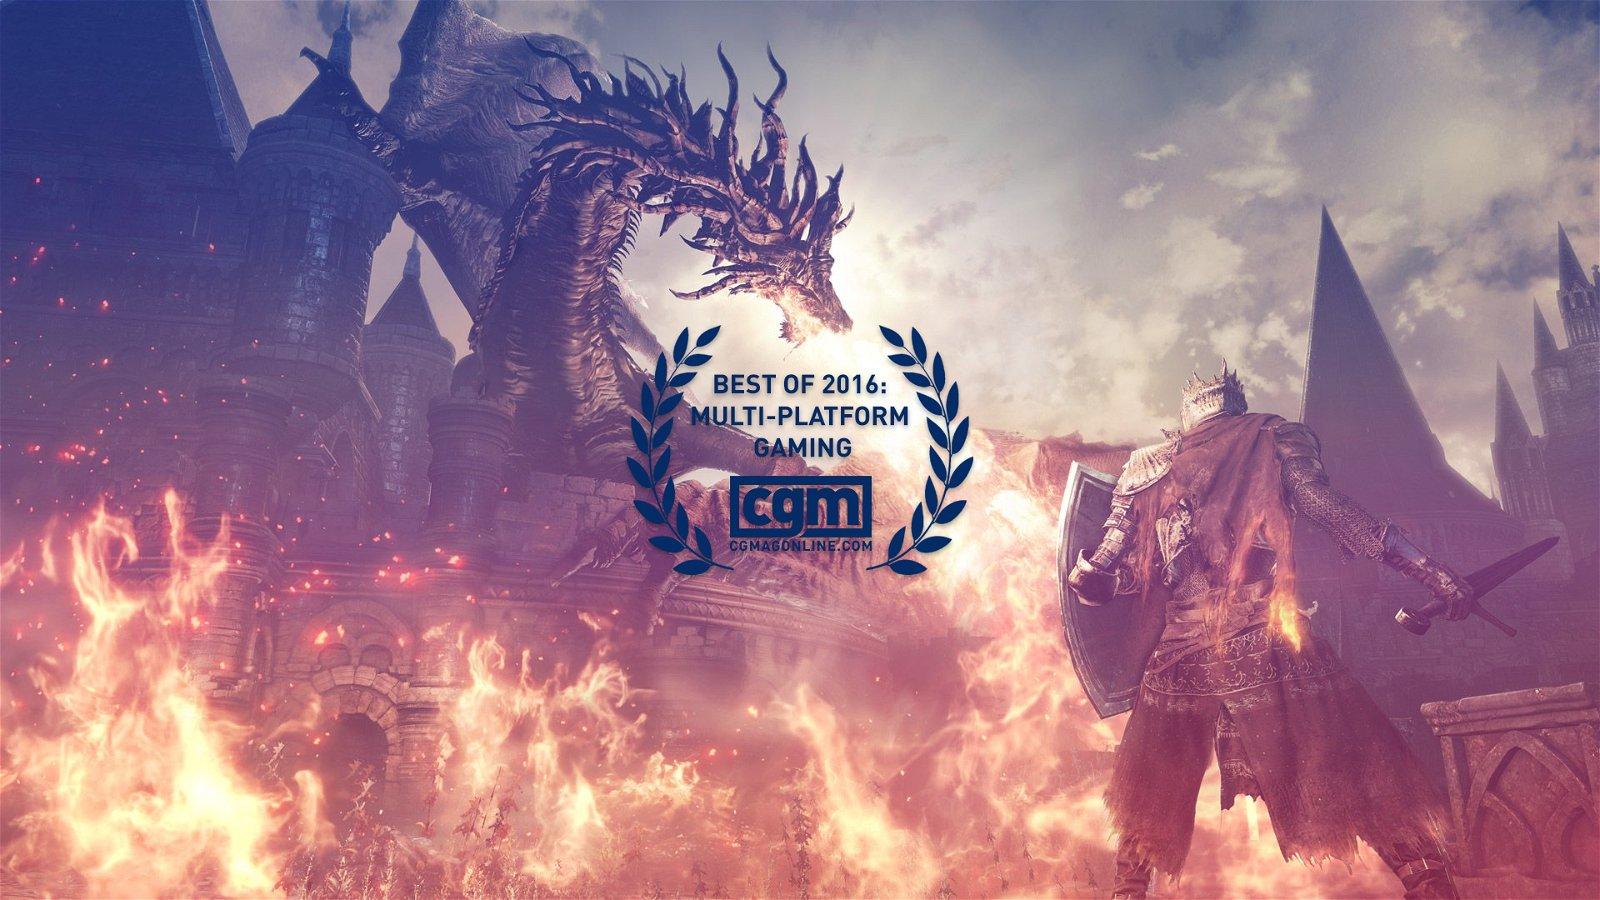 Best of 2016: Multi-Platform Gaming